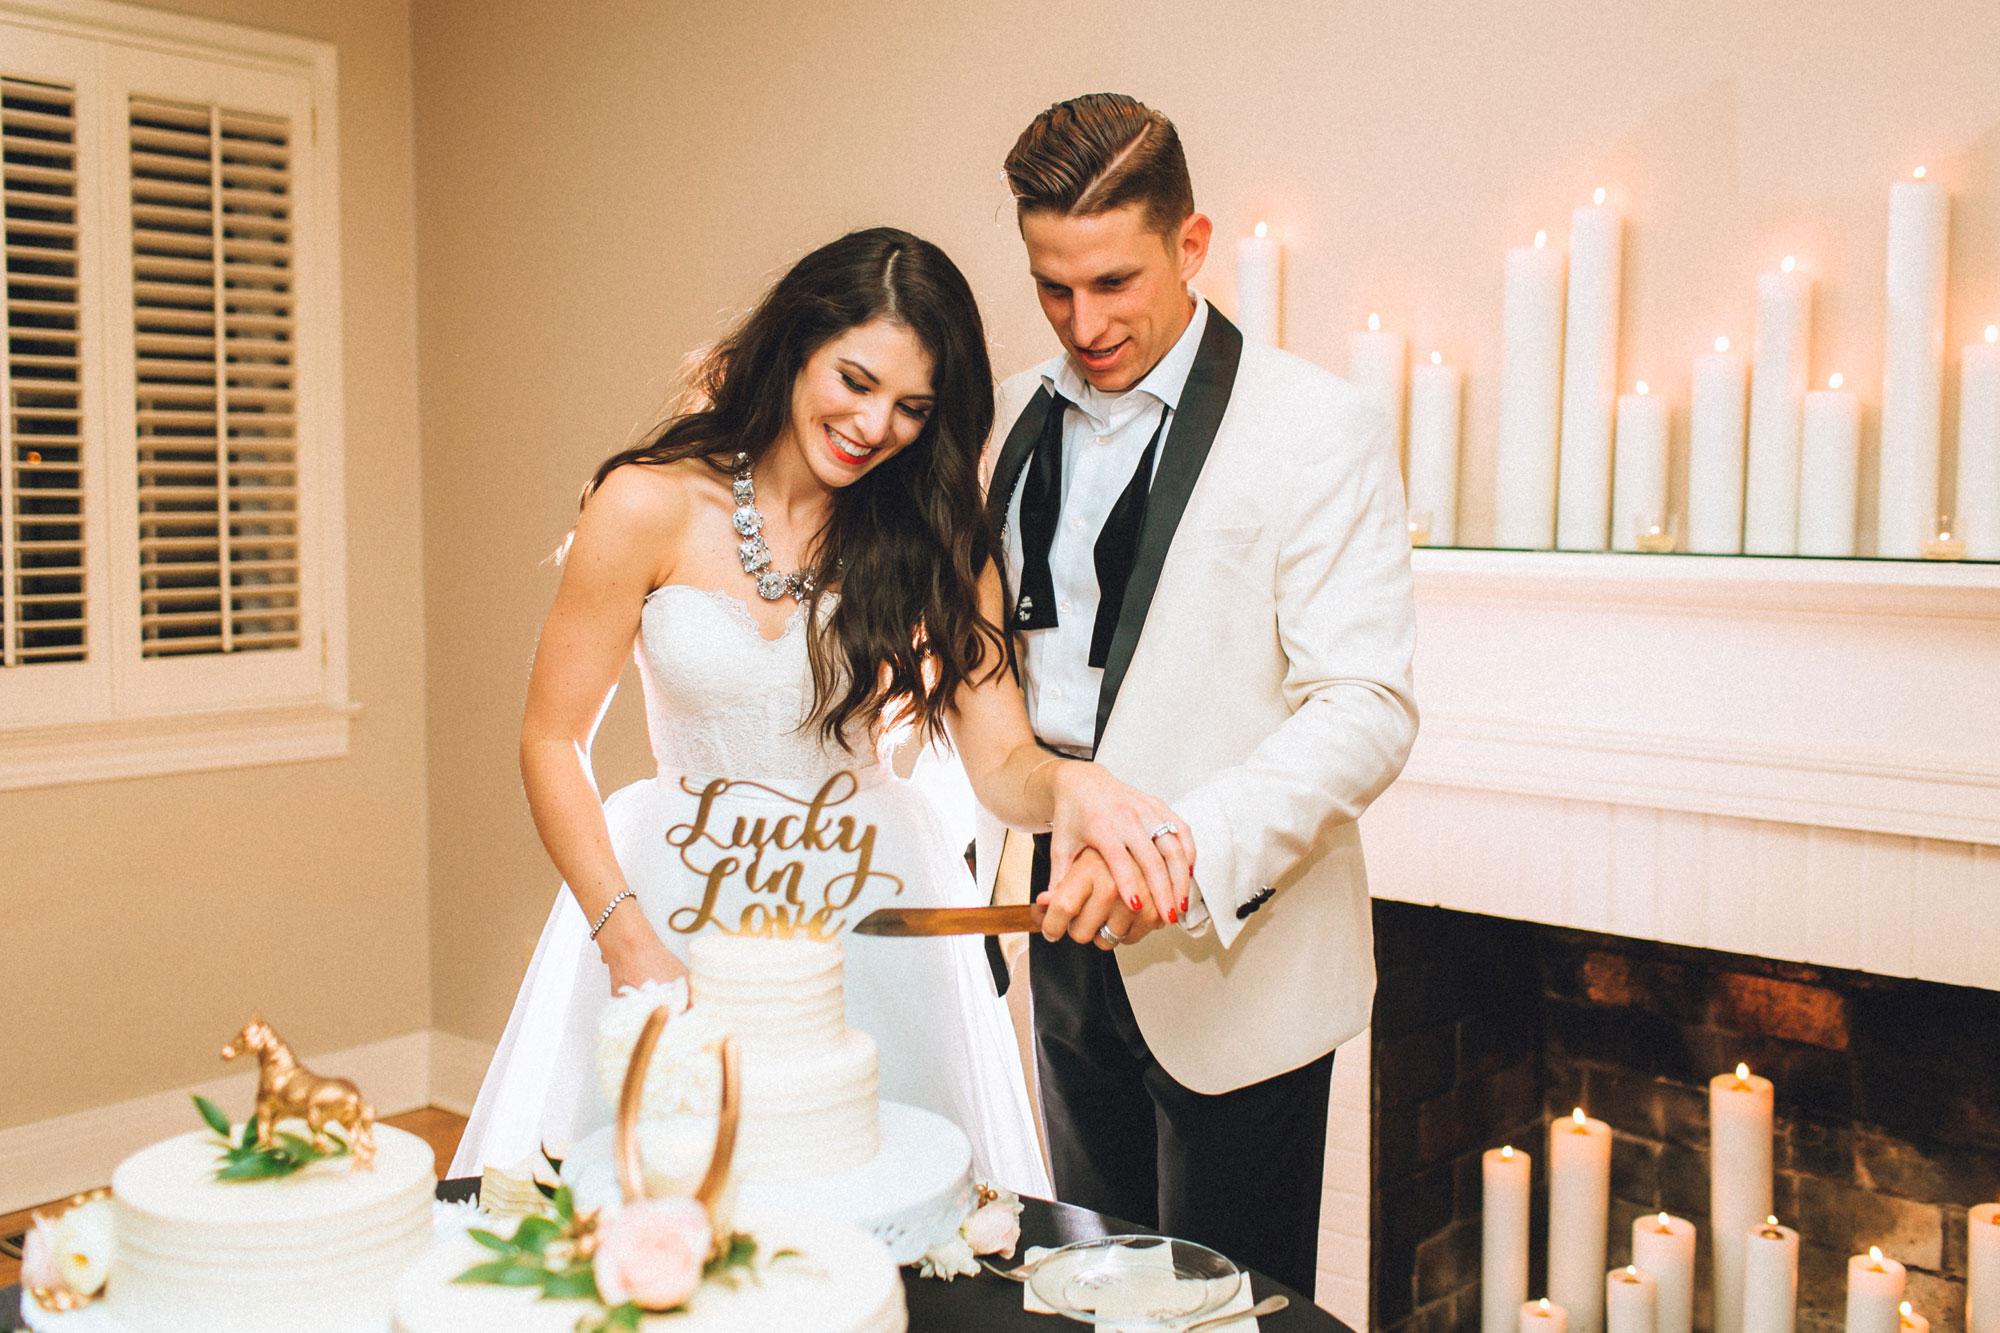 Me & Mr. Jones Wedding, Cutting the Cake, Funfetti Cake, Lasercut Lucky in Love Cake Topper, Gold Wedding, Black Tie Wedding in Nashville, TN